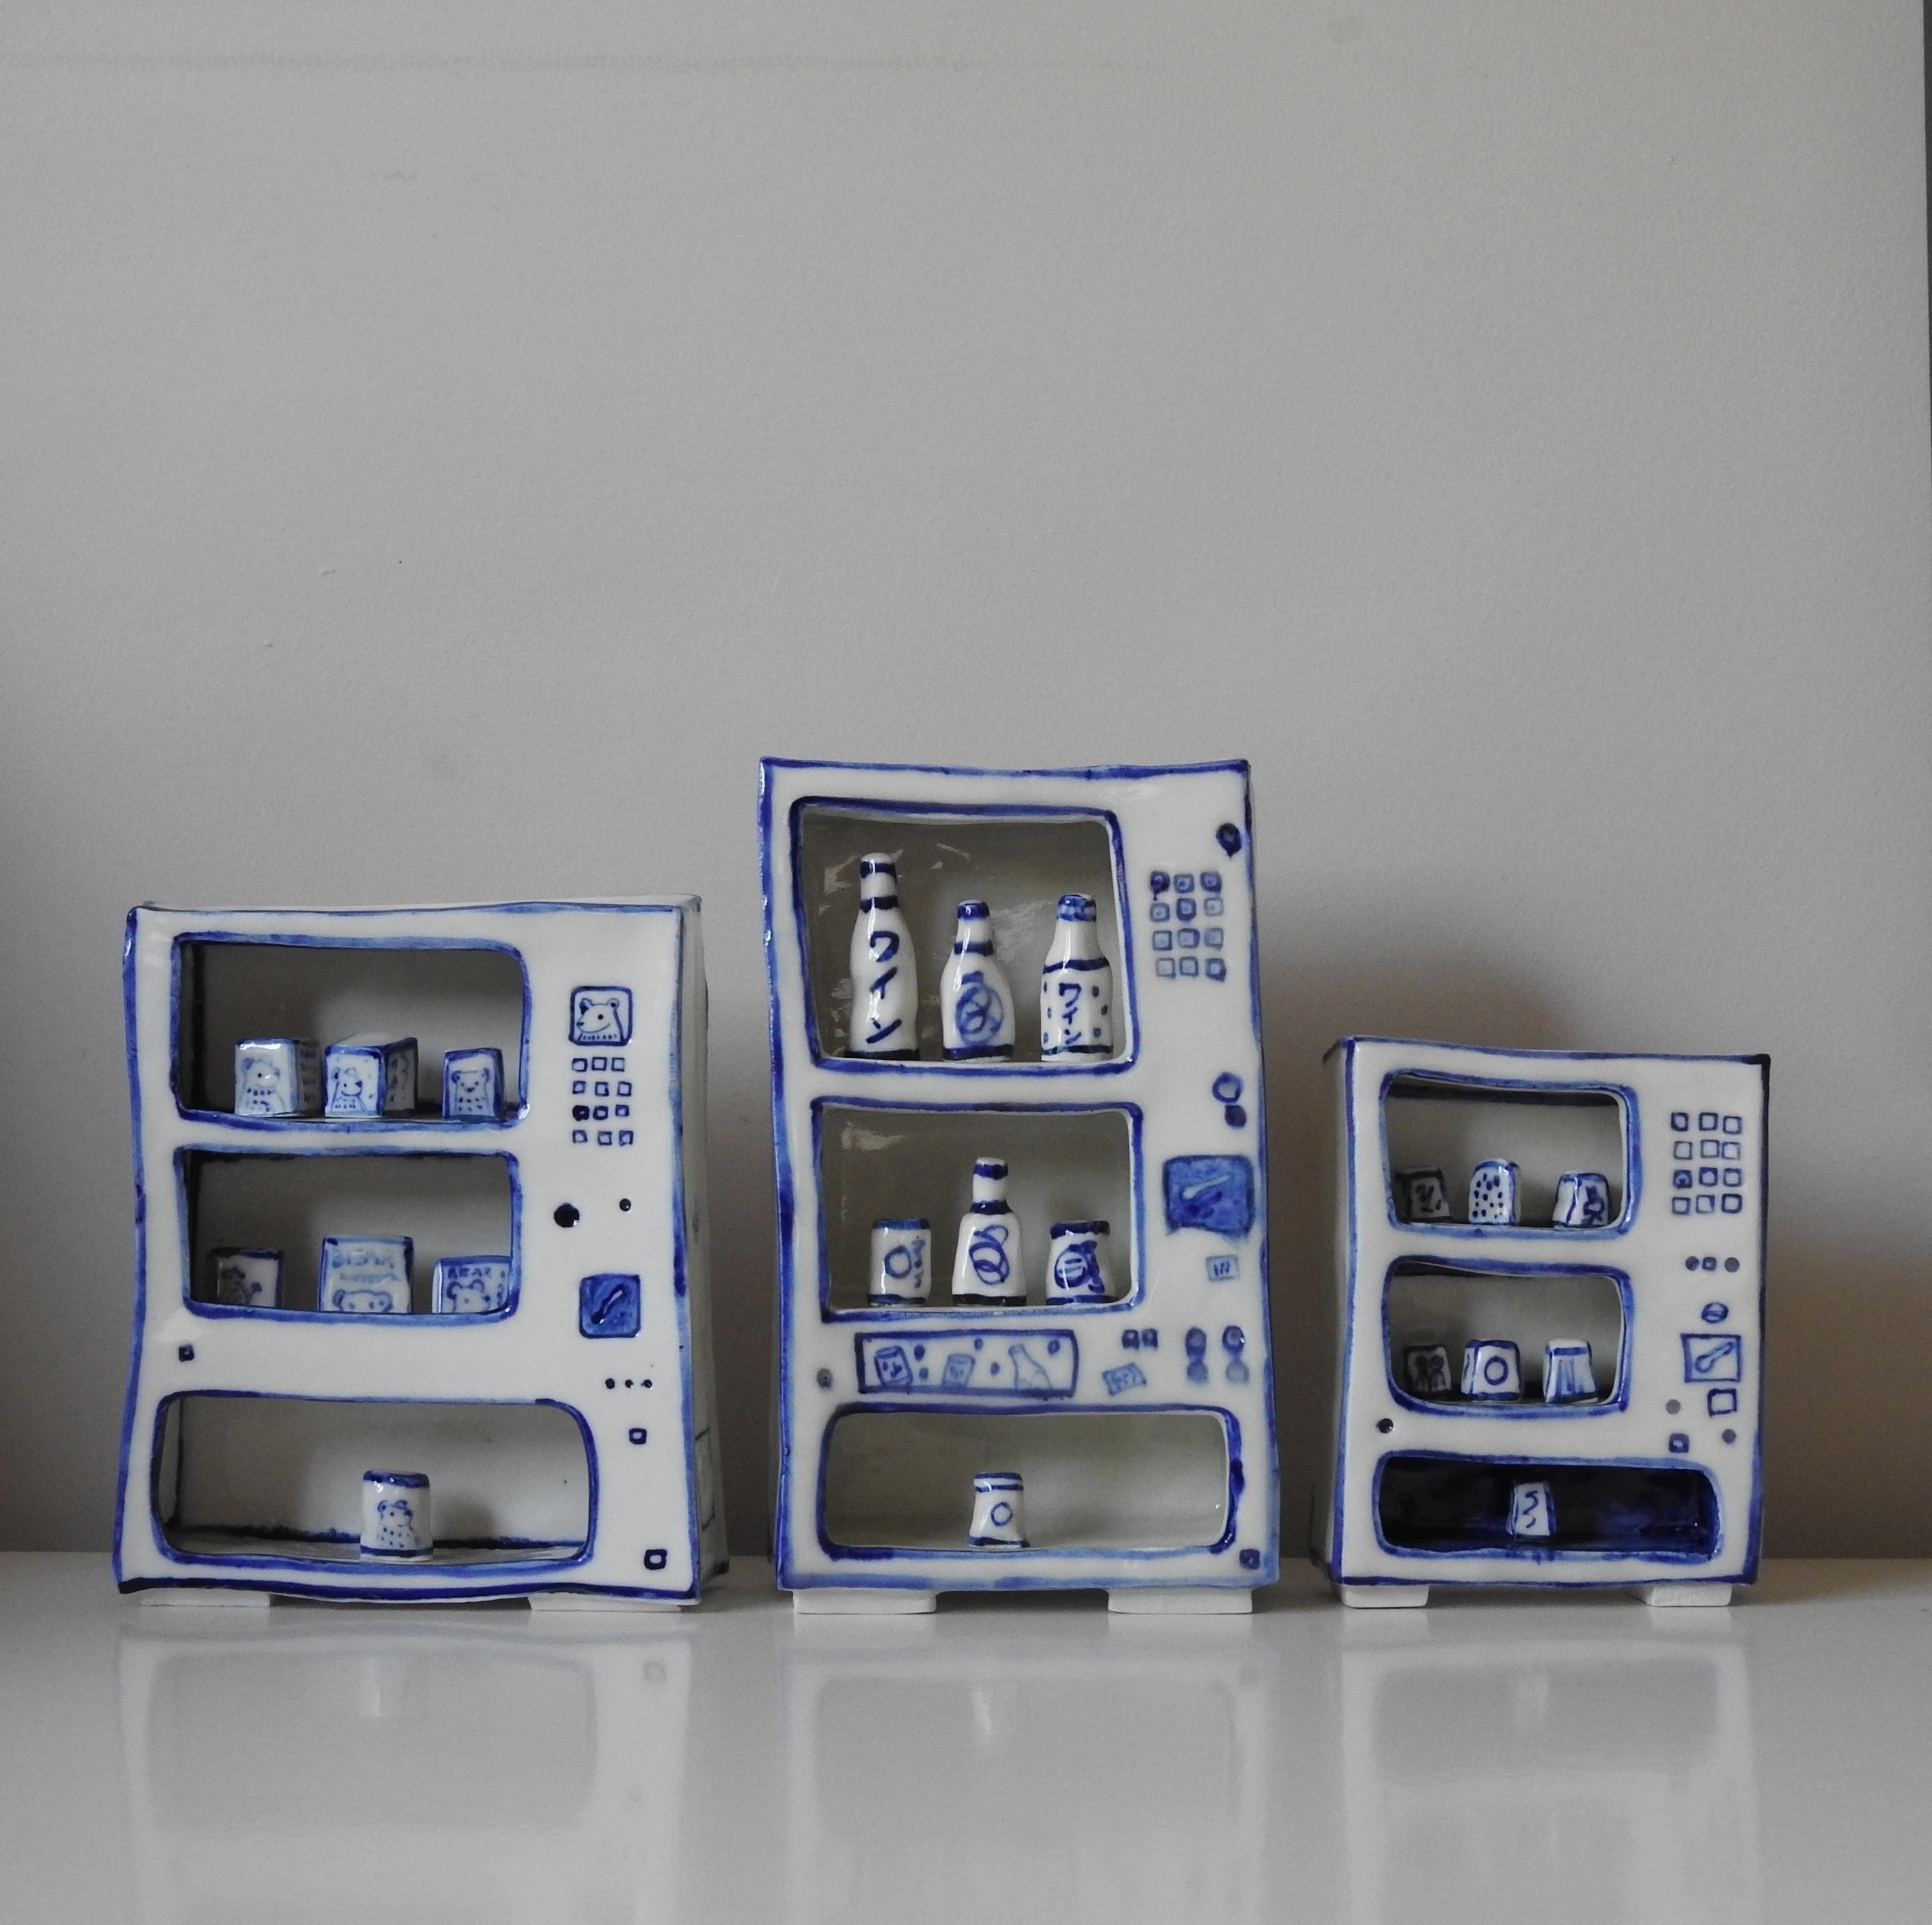 Porcelain 'play' vending machin - bluebearvendingco | ello